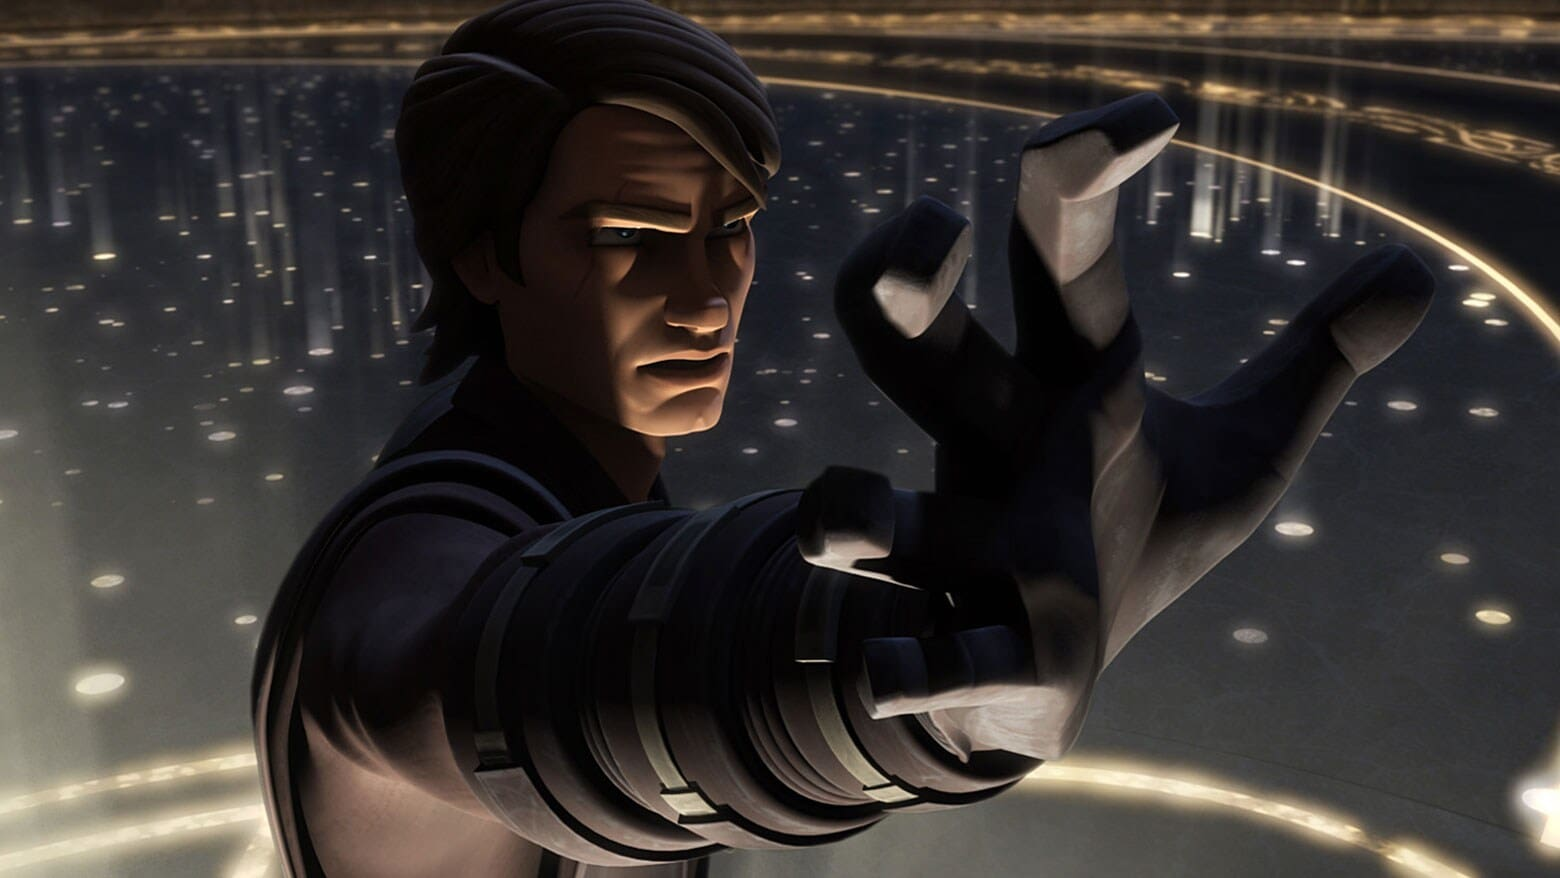 STAR WARS LA VENDETTA DEI SITH Anakin Skywalker Action Figure no2